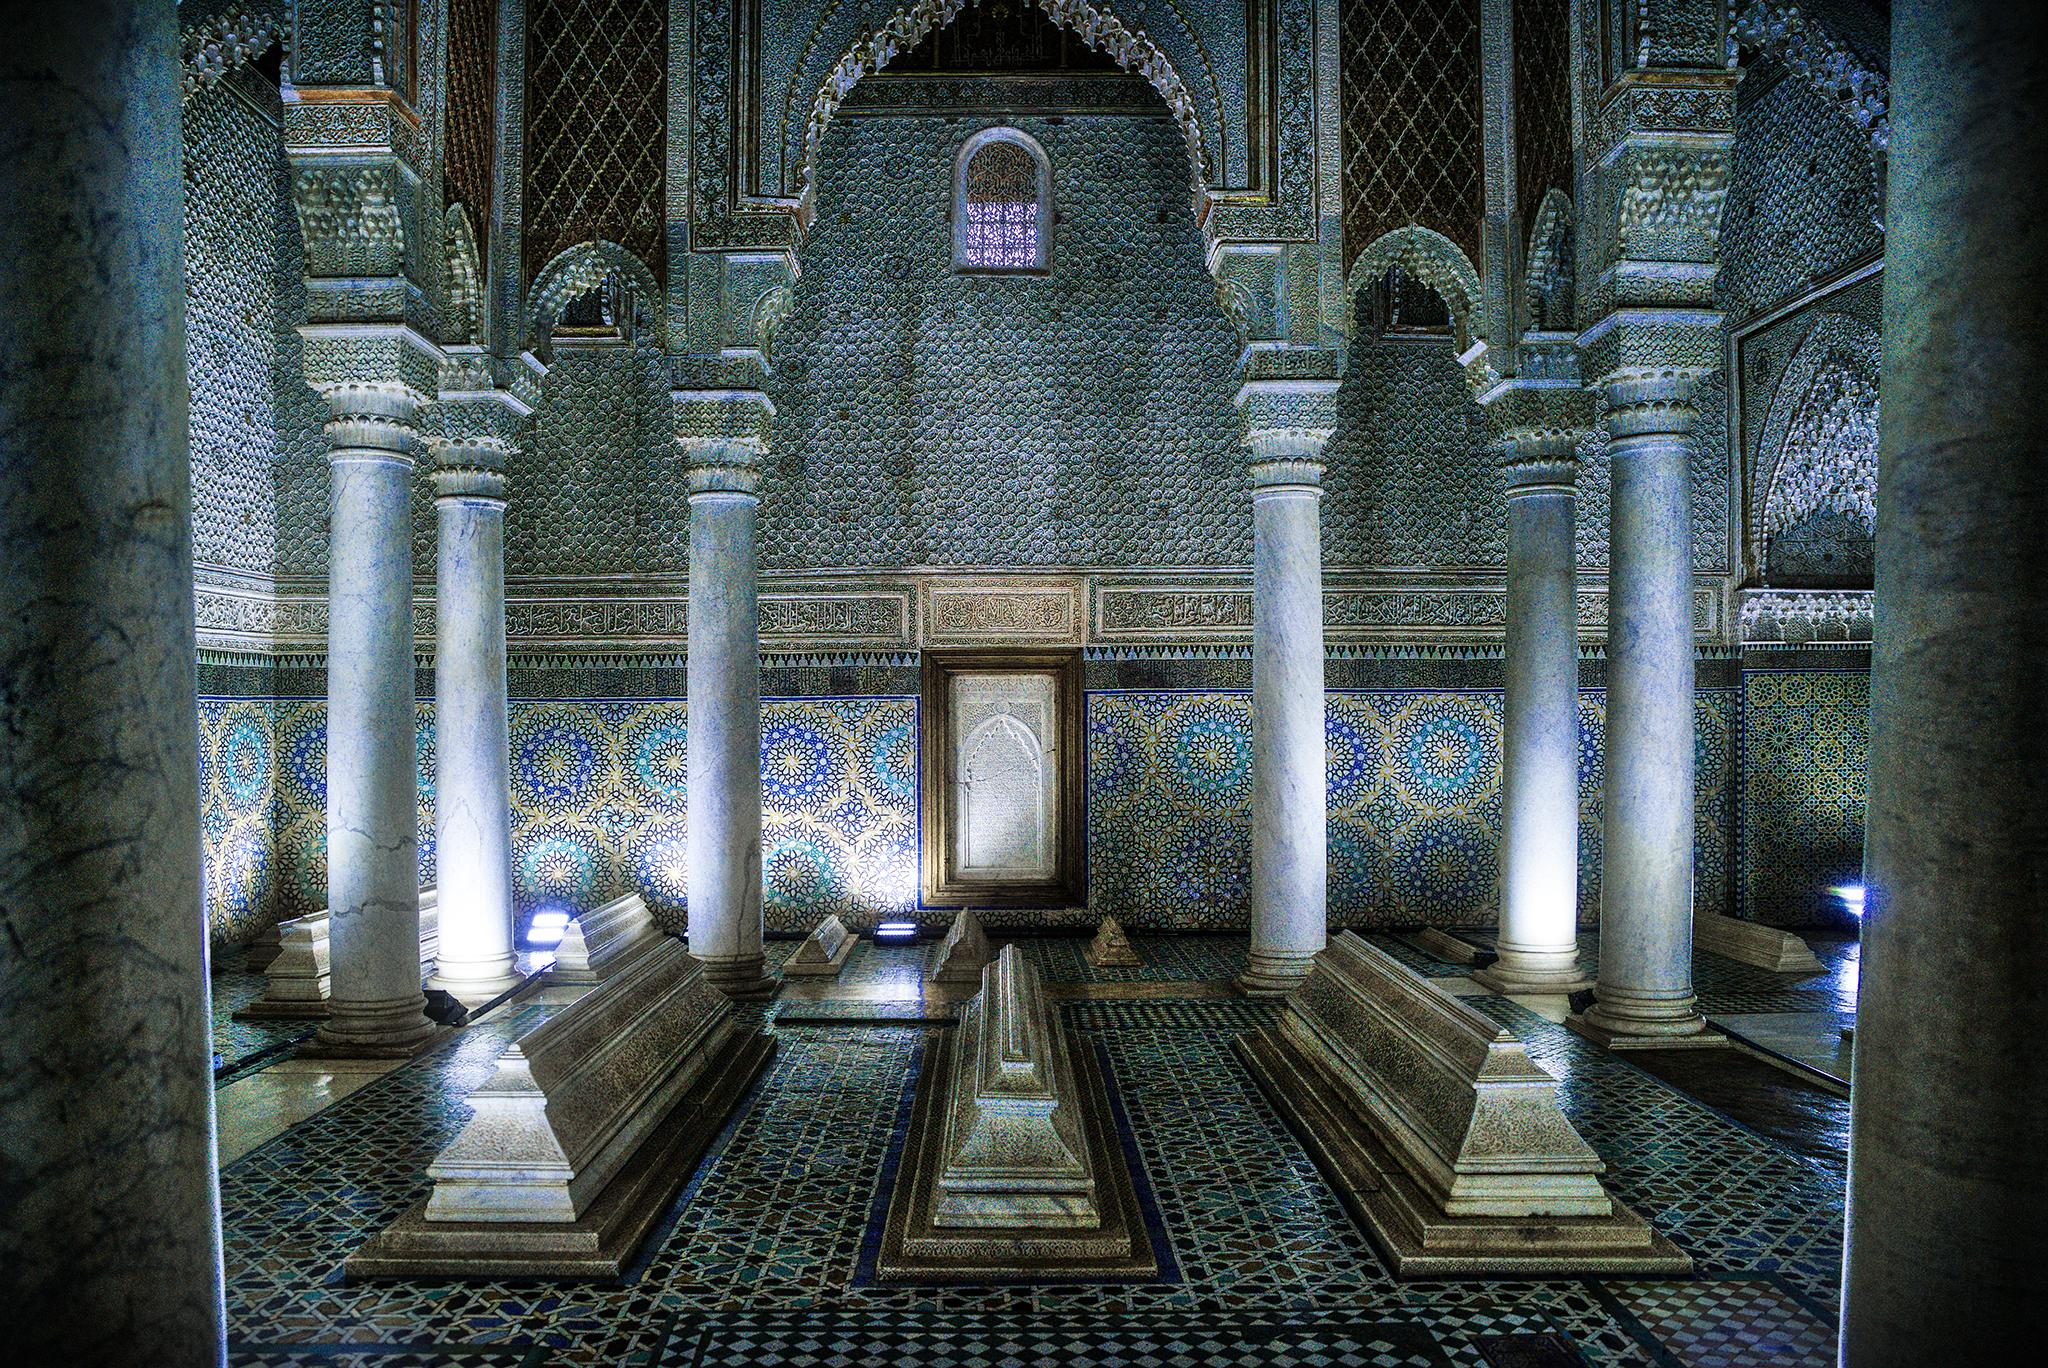 The Saadian tombs, Morocco